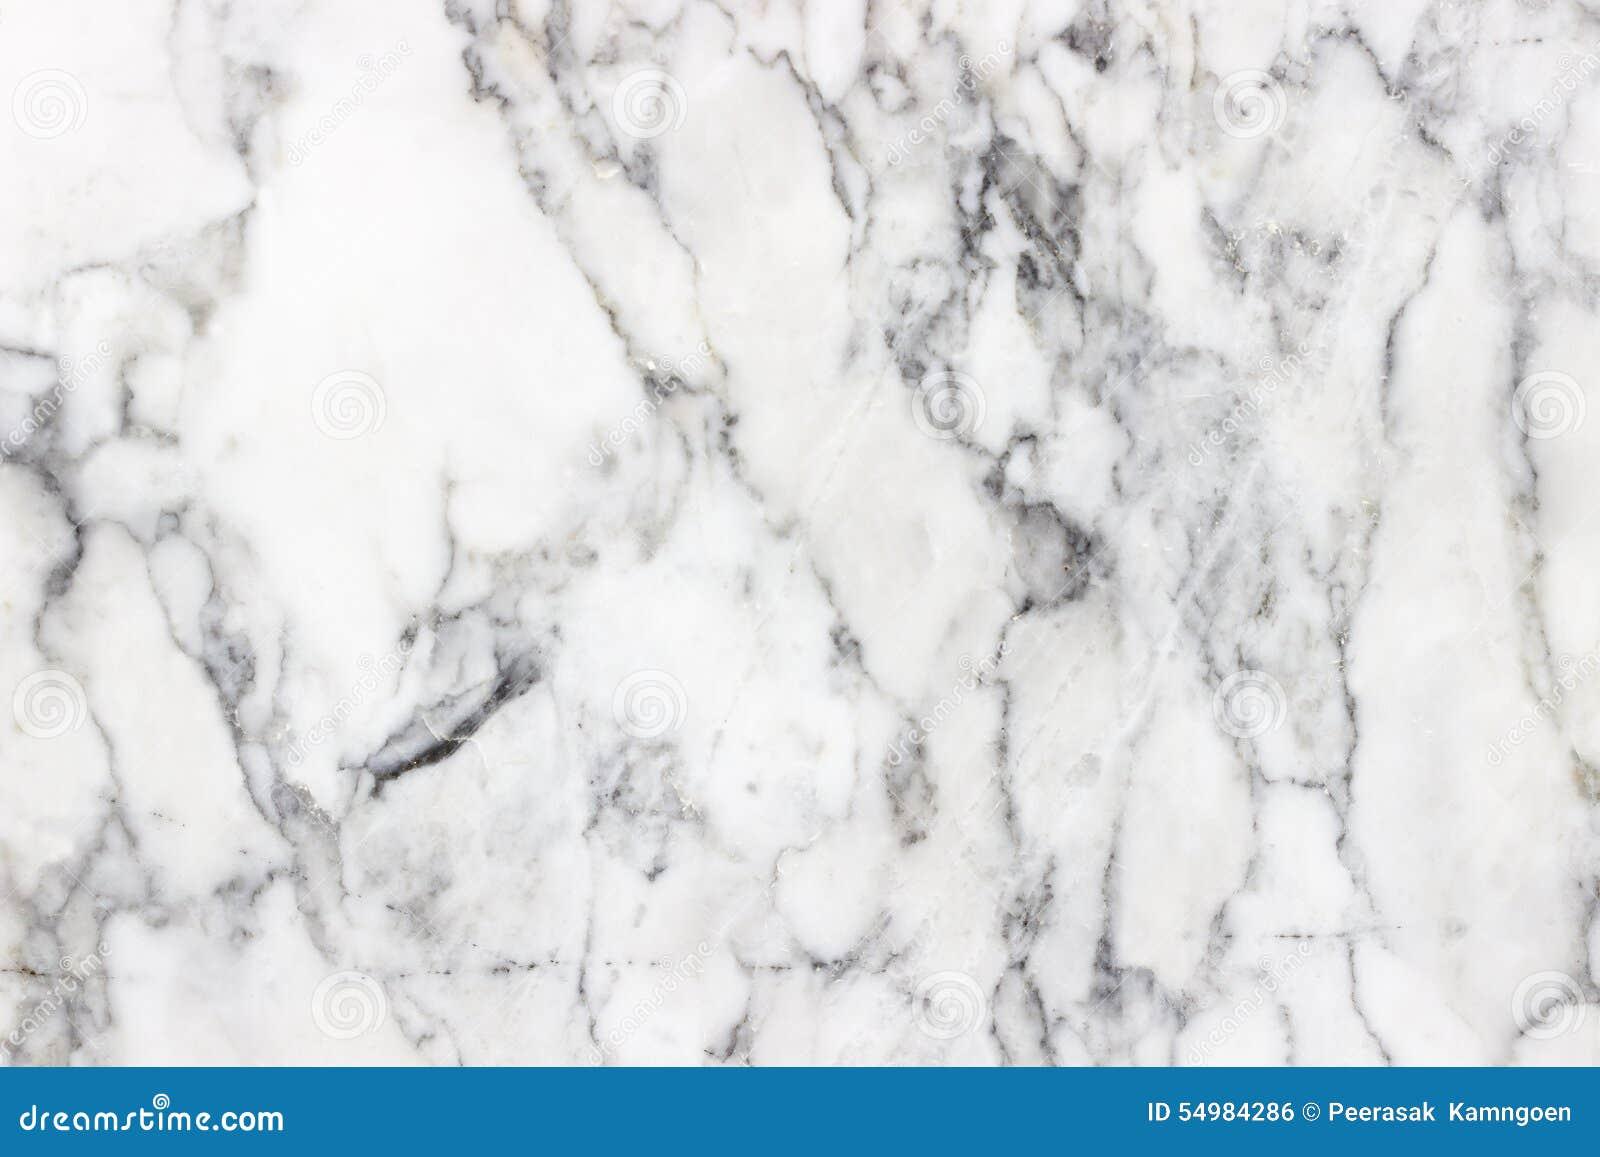 White marble stone background granite grunge nature detail